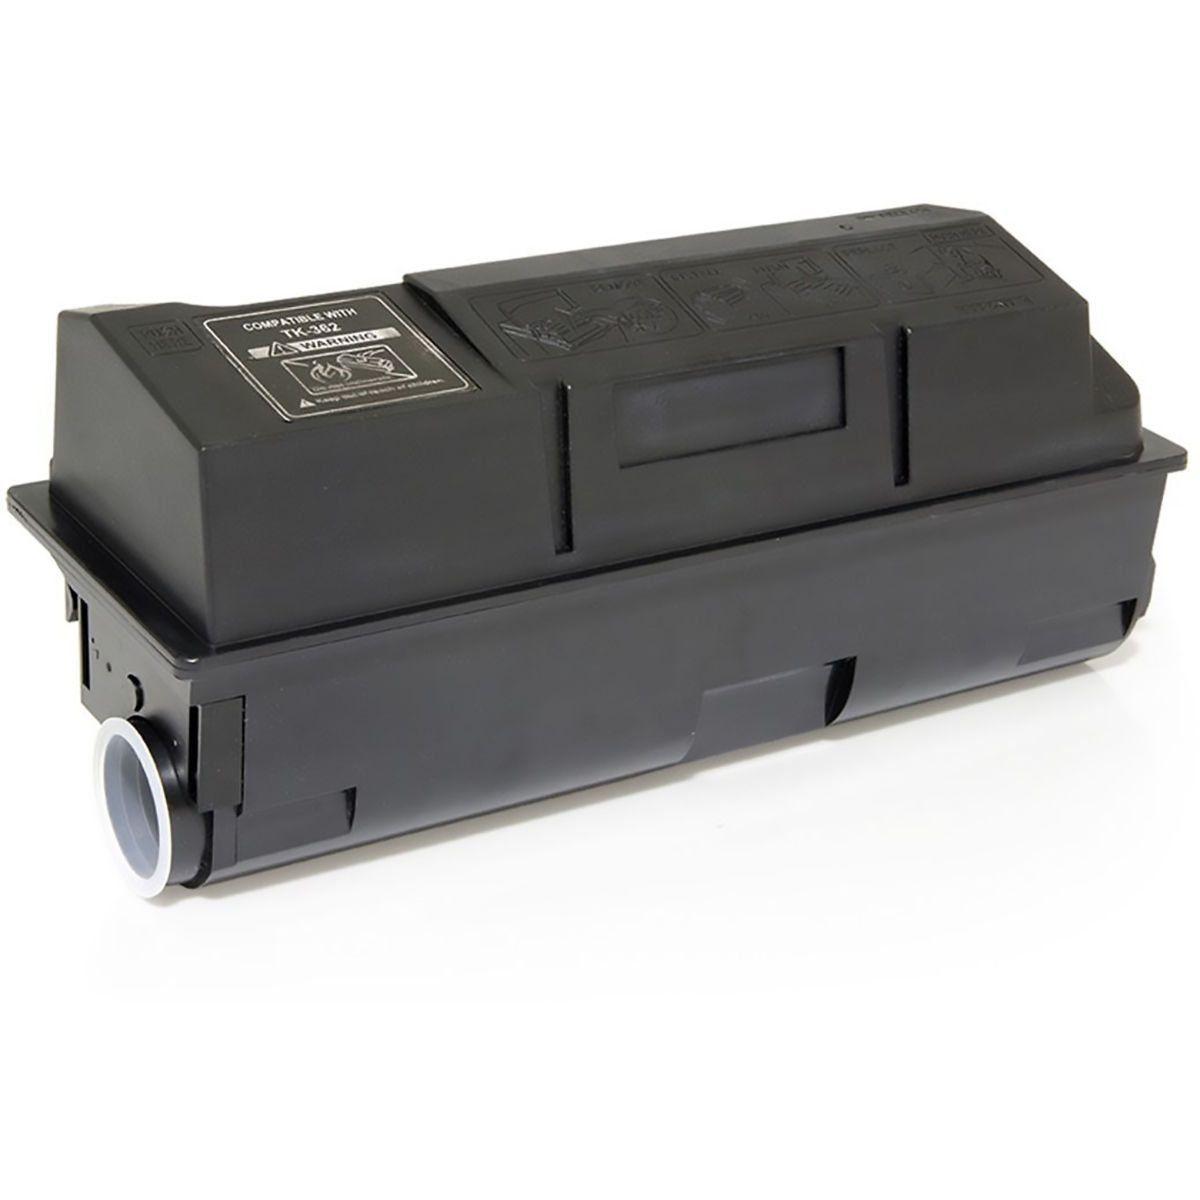 Compatível: Toner TK360 TK362 para Impressora Kyocera FS4020 FS4020d FS4020dn FS-4020 4020d 4020dn / Preto / 20.000